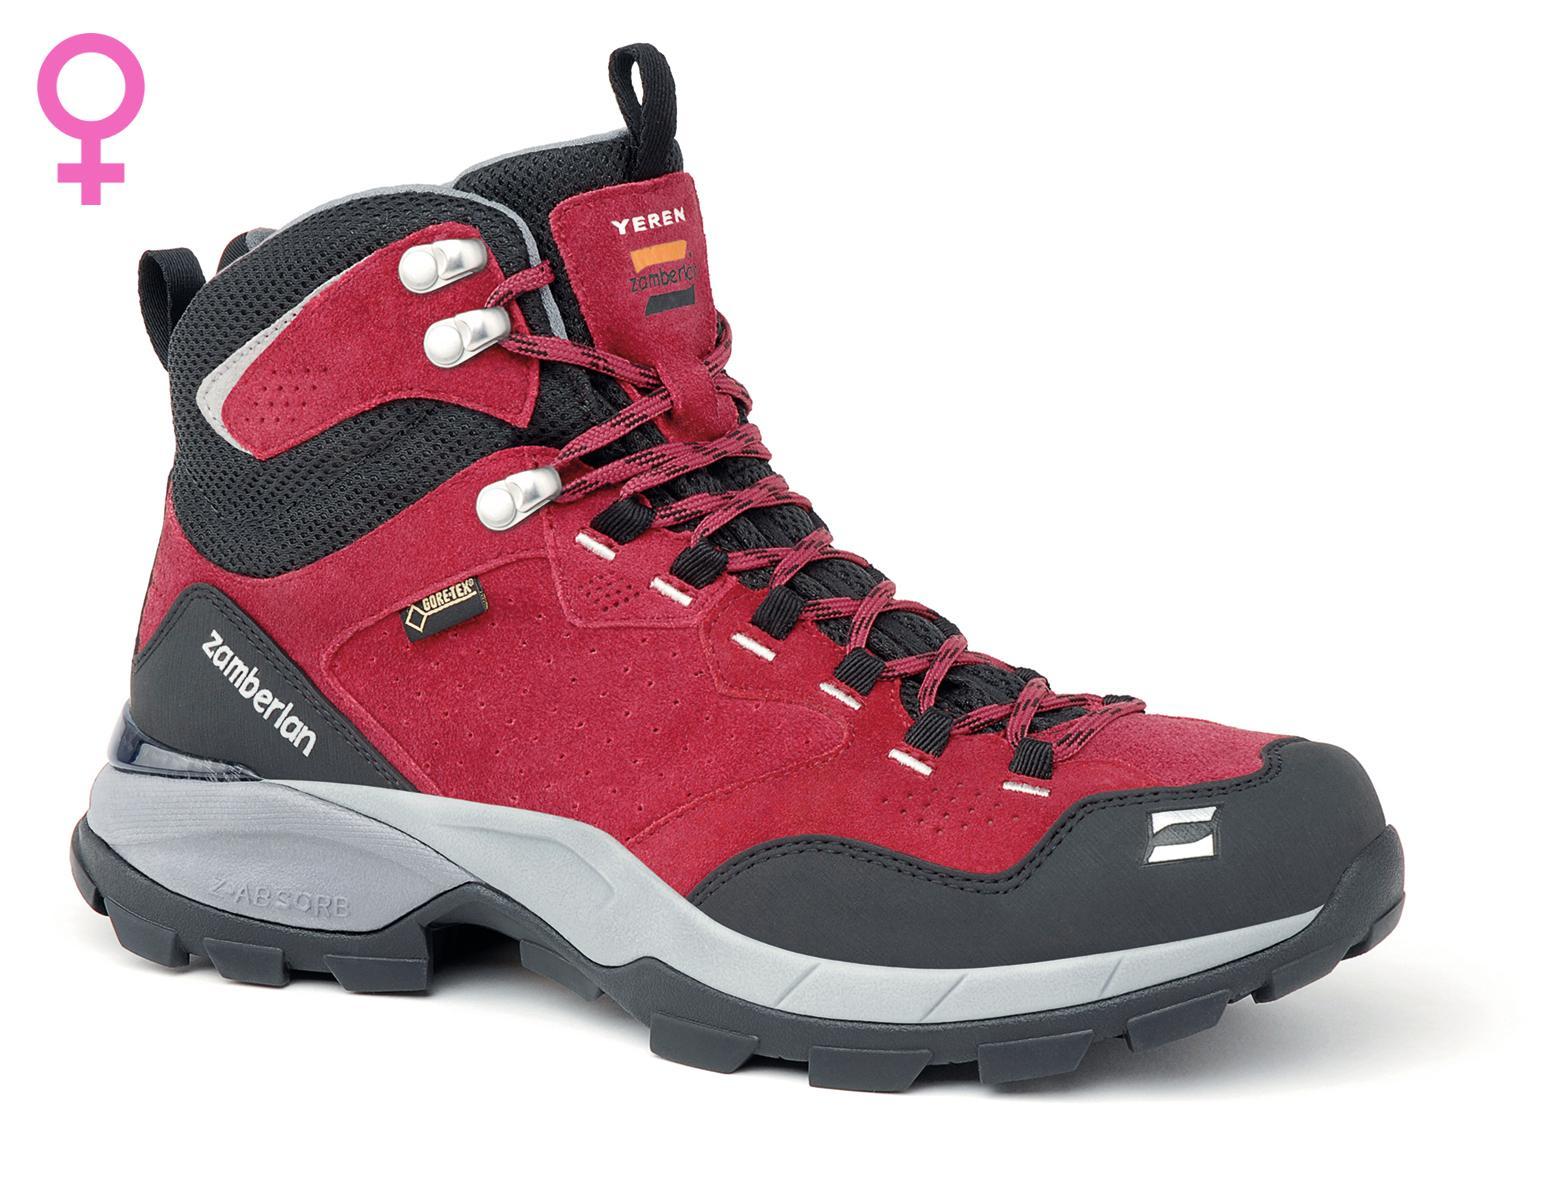 252 YEREN GTX® RR WNS   -   Scarponi  Hiking   -   Gerbera